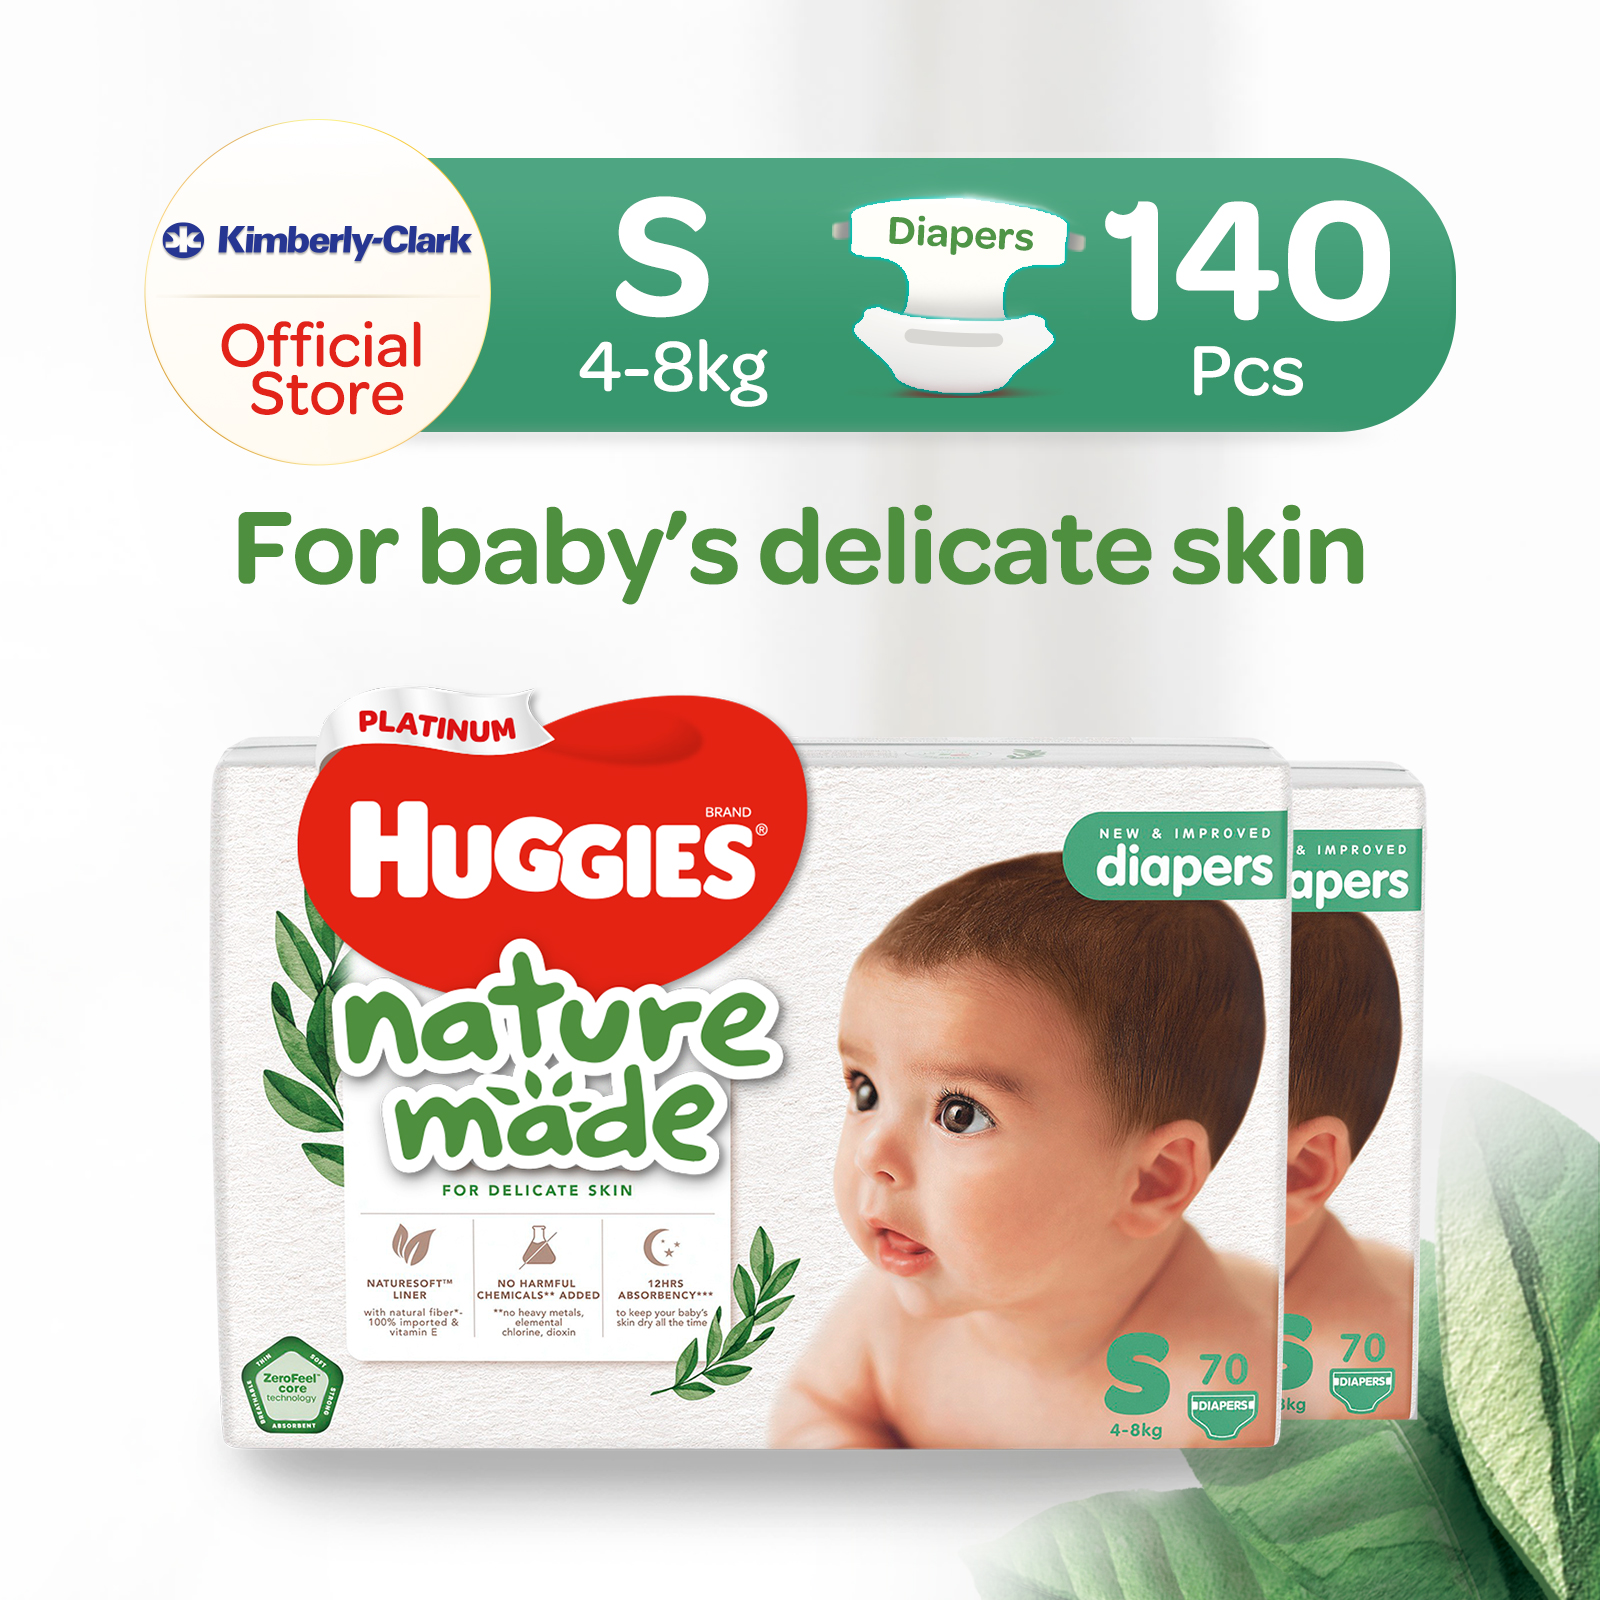 [Bundle Of 2] Huggies Platinum Naturemade Tape Diapers S x2 140pcs